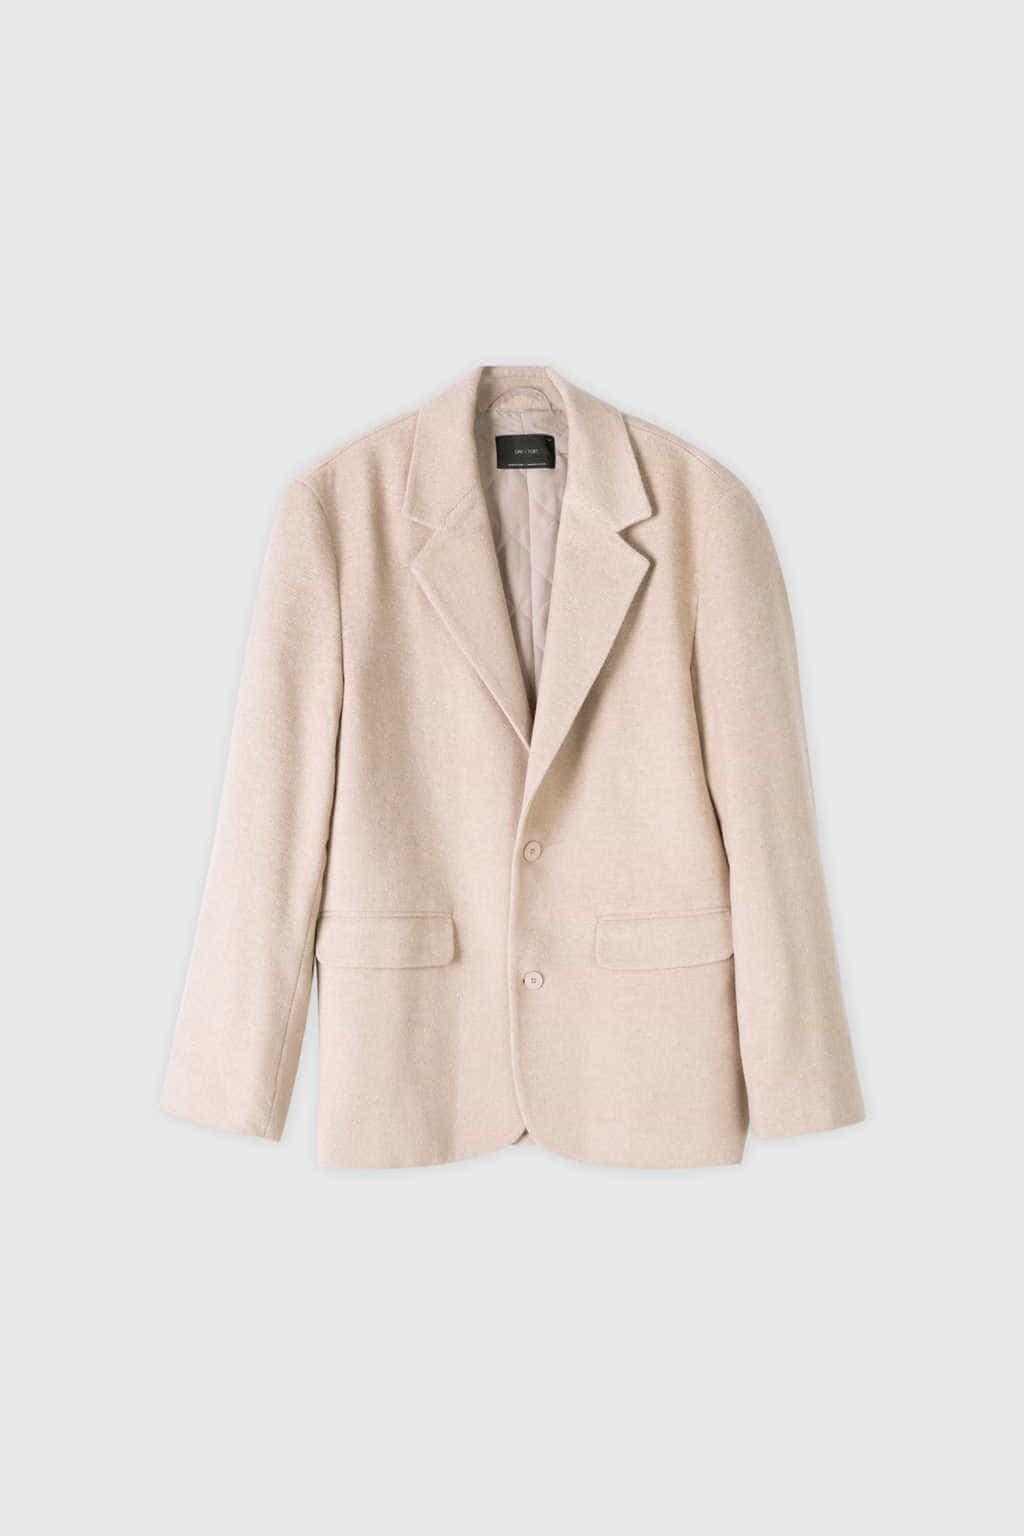 Jacket 2753 Beige 5